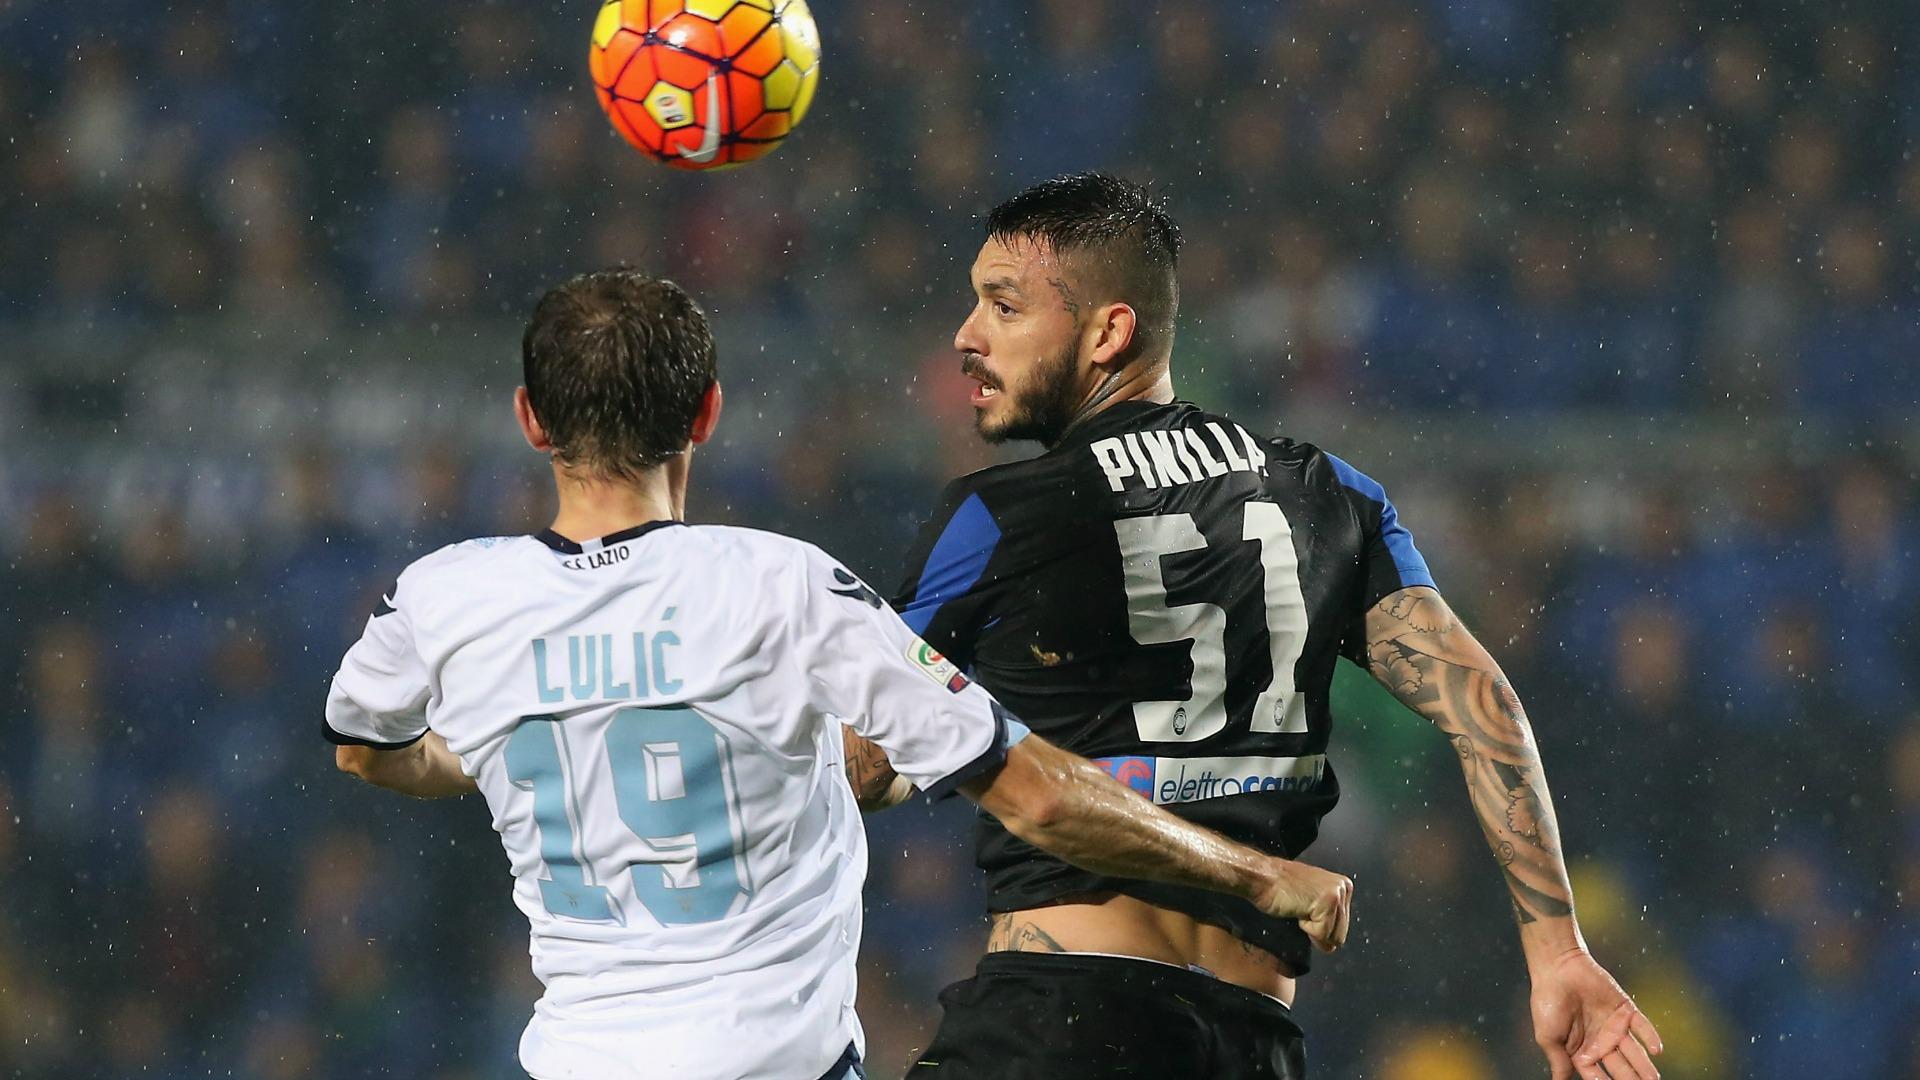 Video: Atalanta vs Lazio